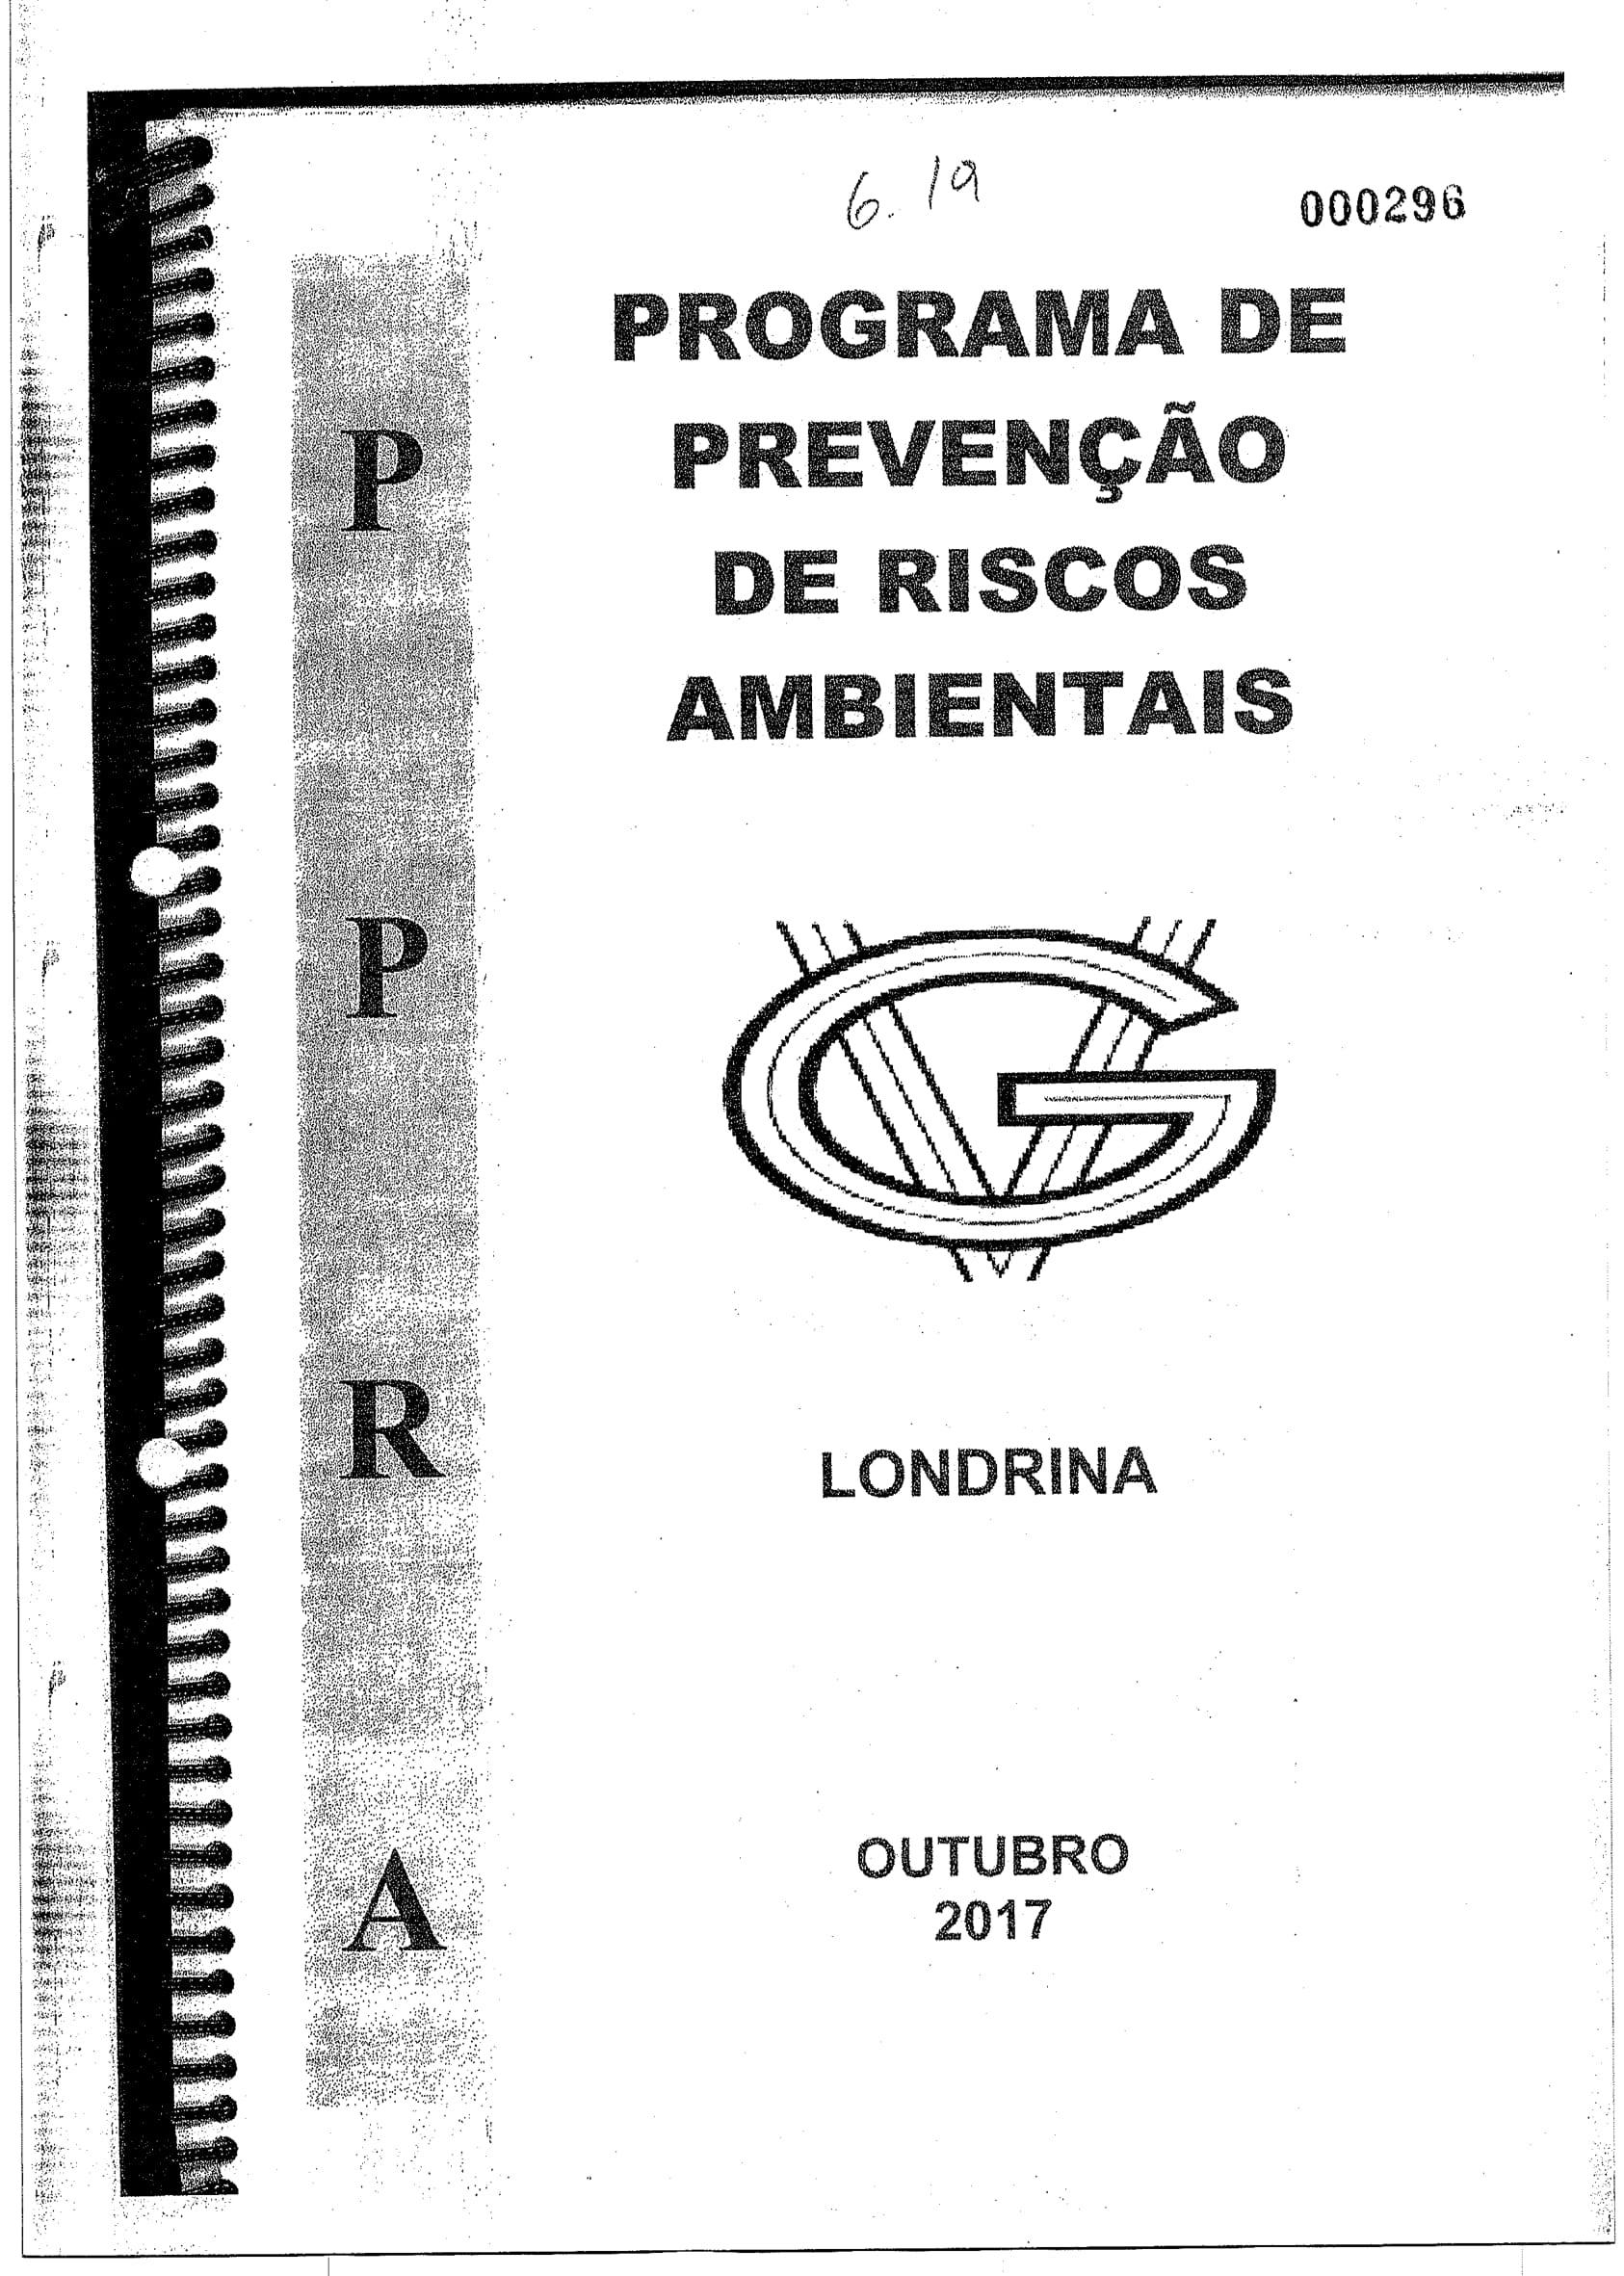 PL001222019-157